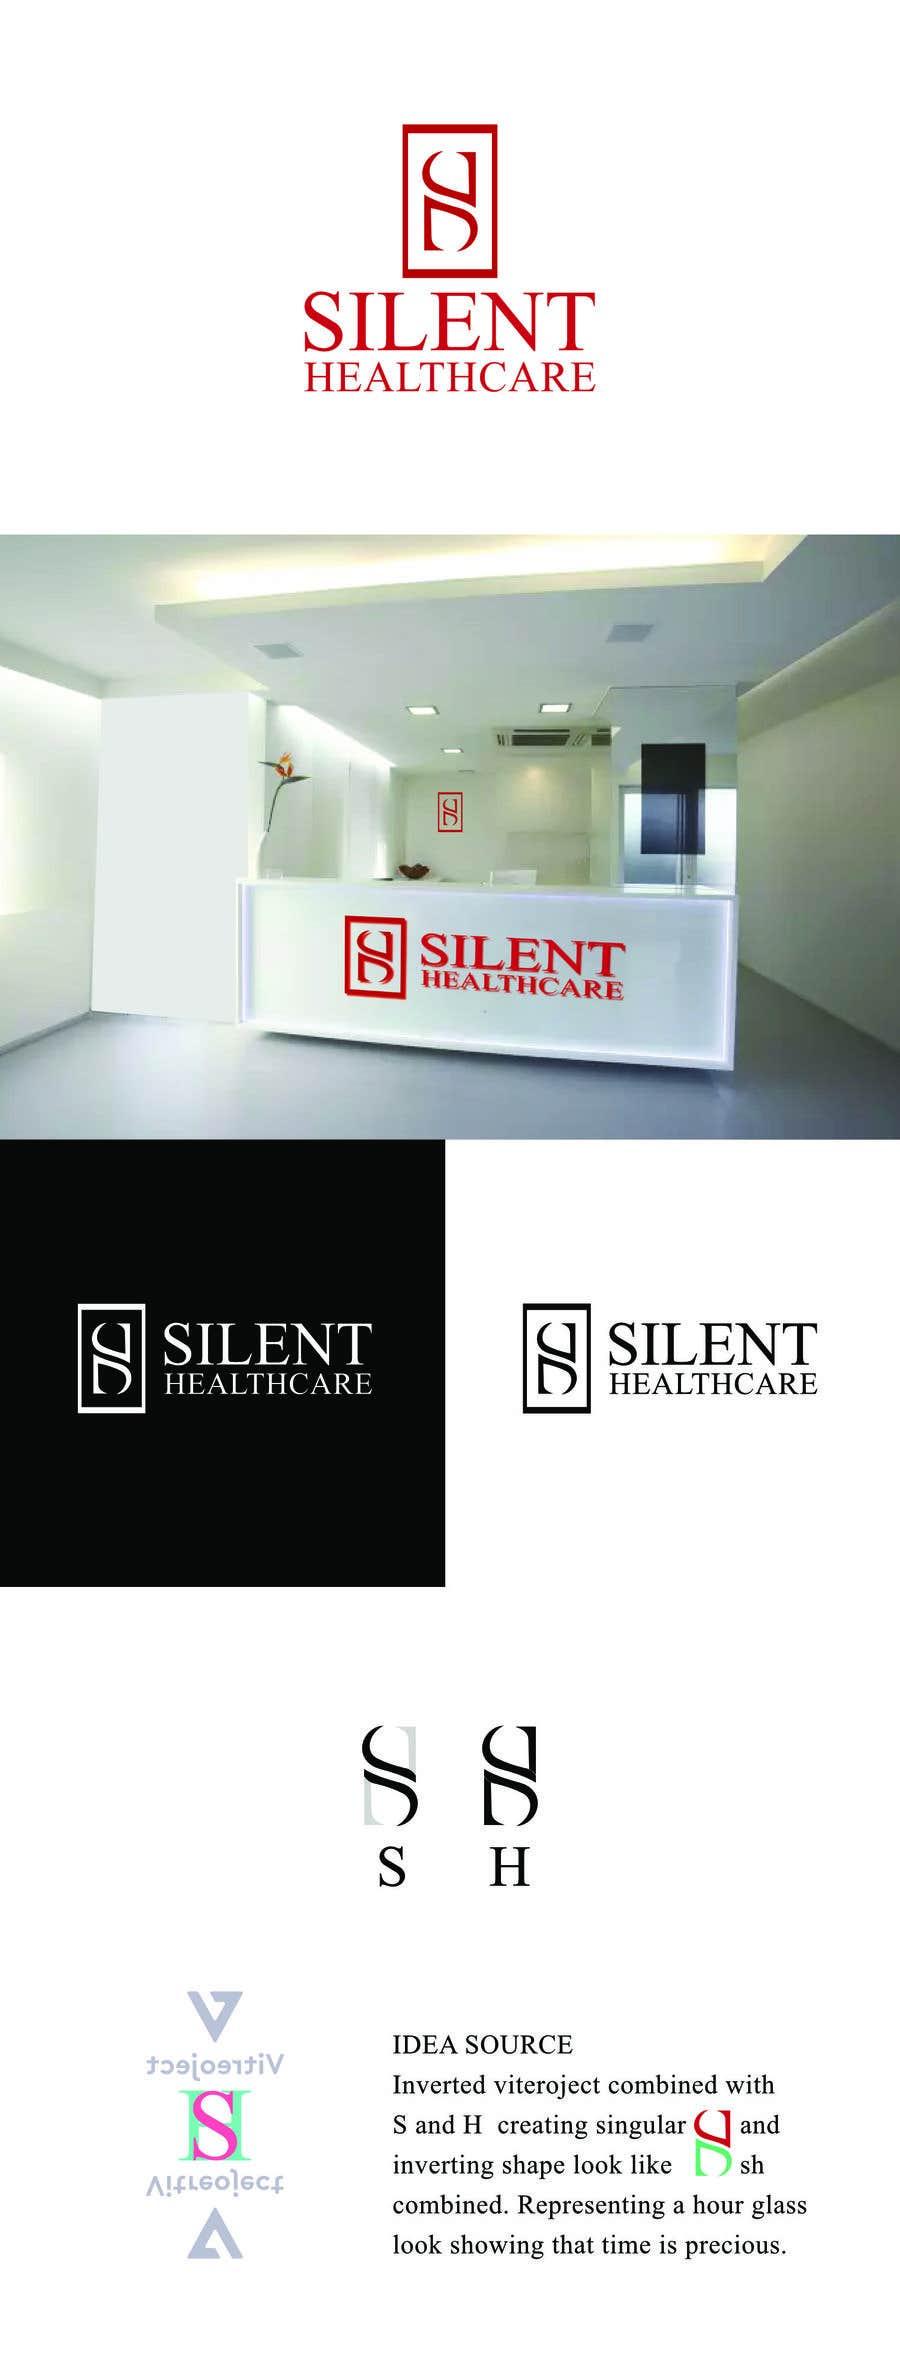 Bài tham dự cuộc thi #229 cho Logo Design for a MedTech company (startup) - Silent Healthcare